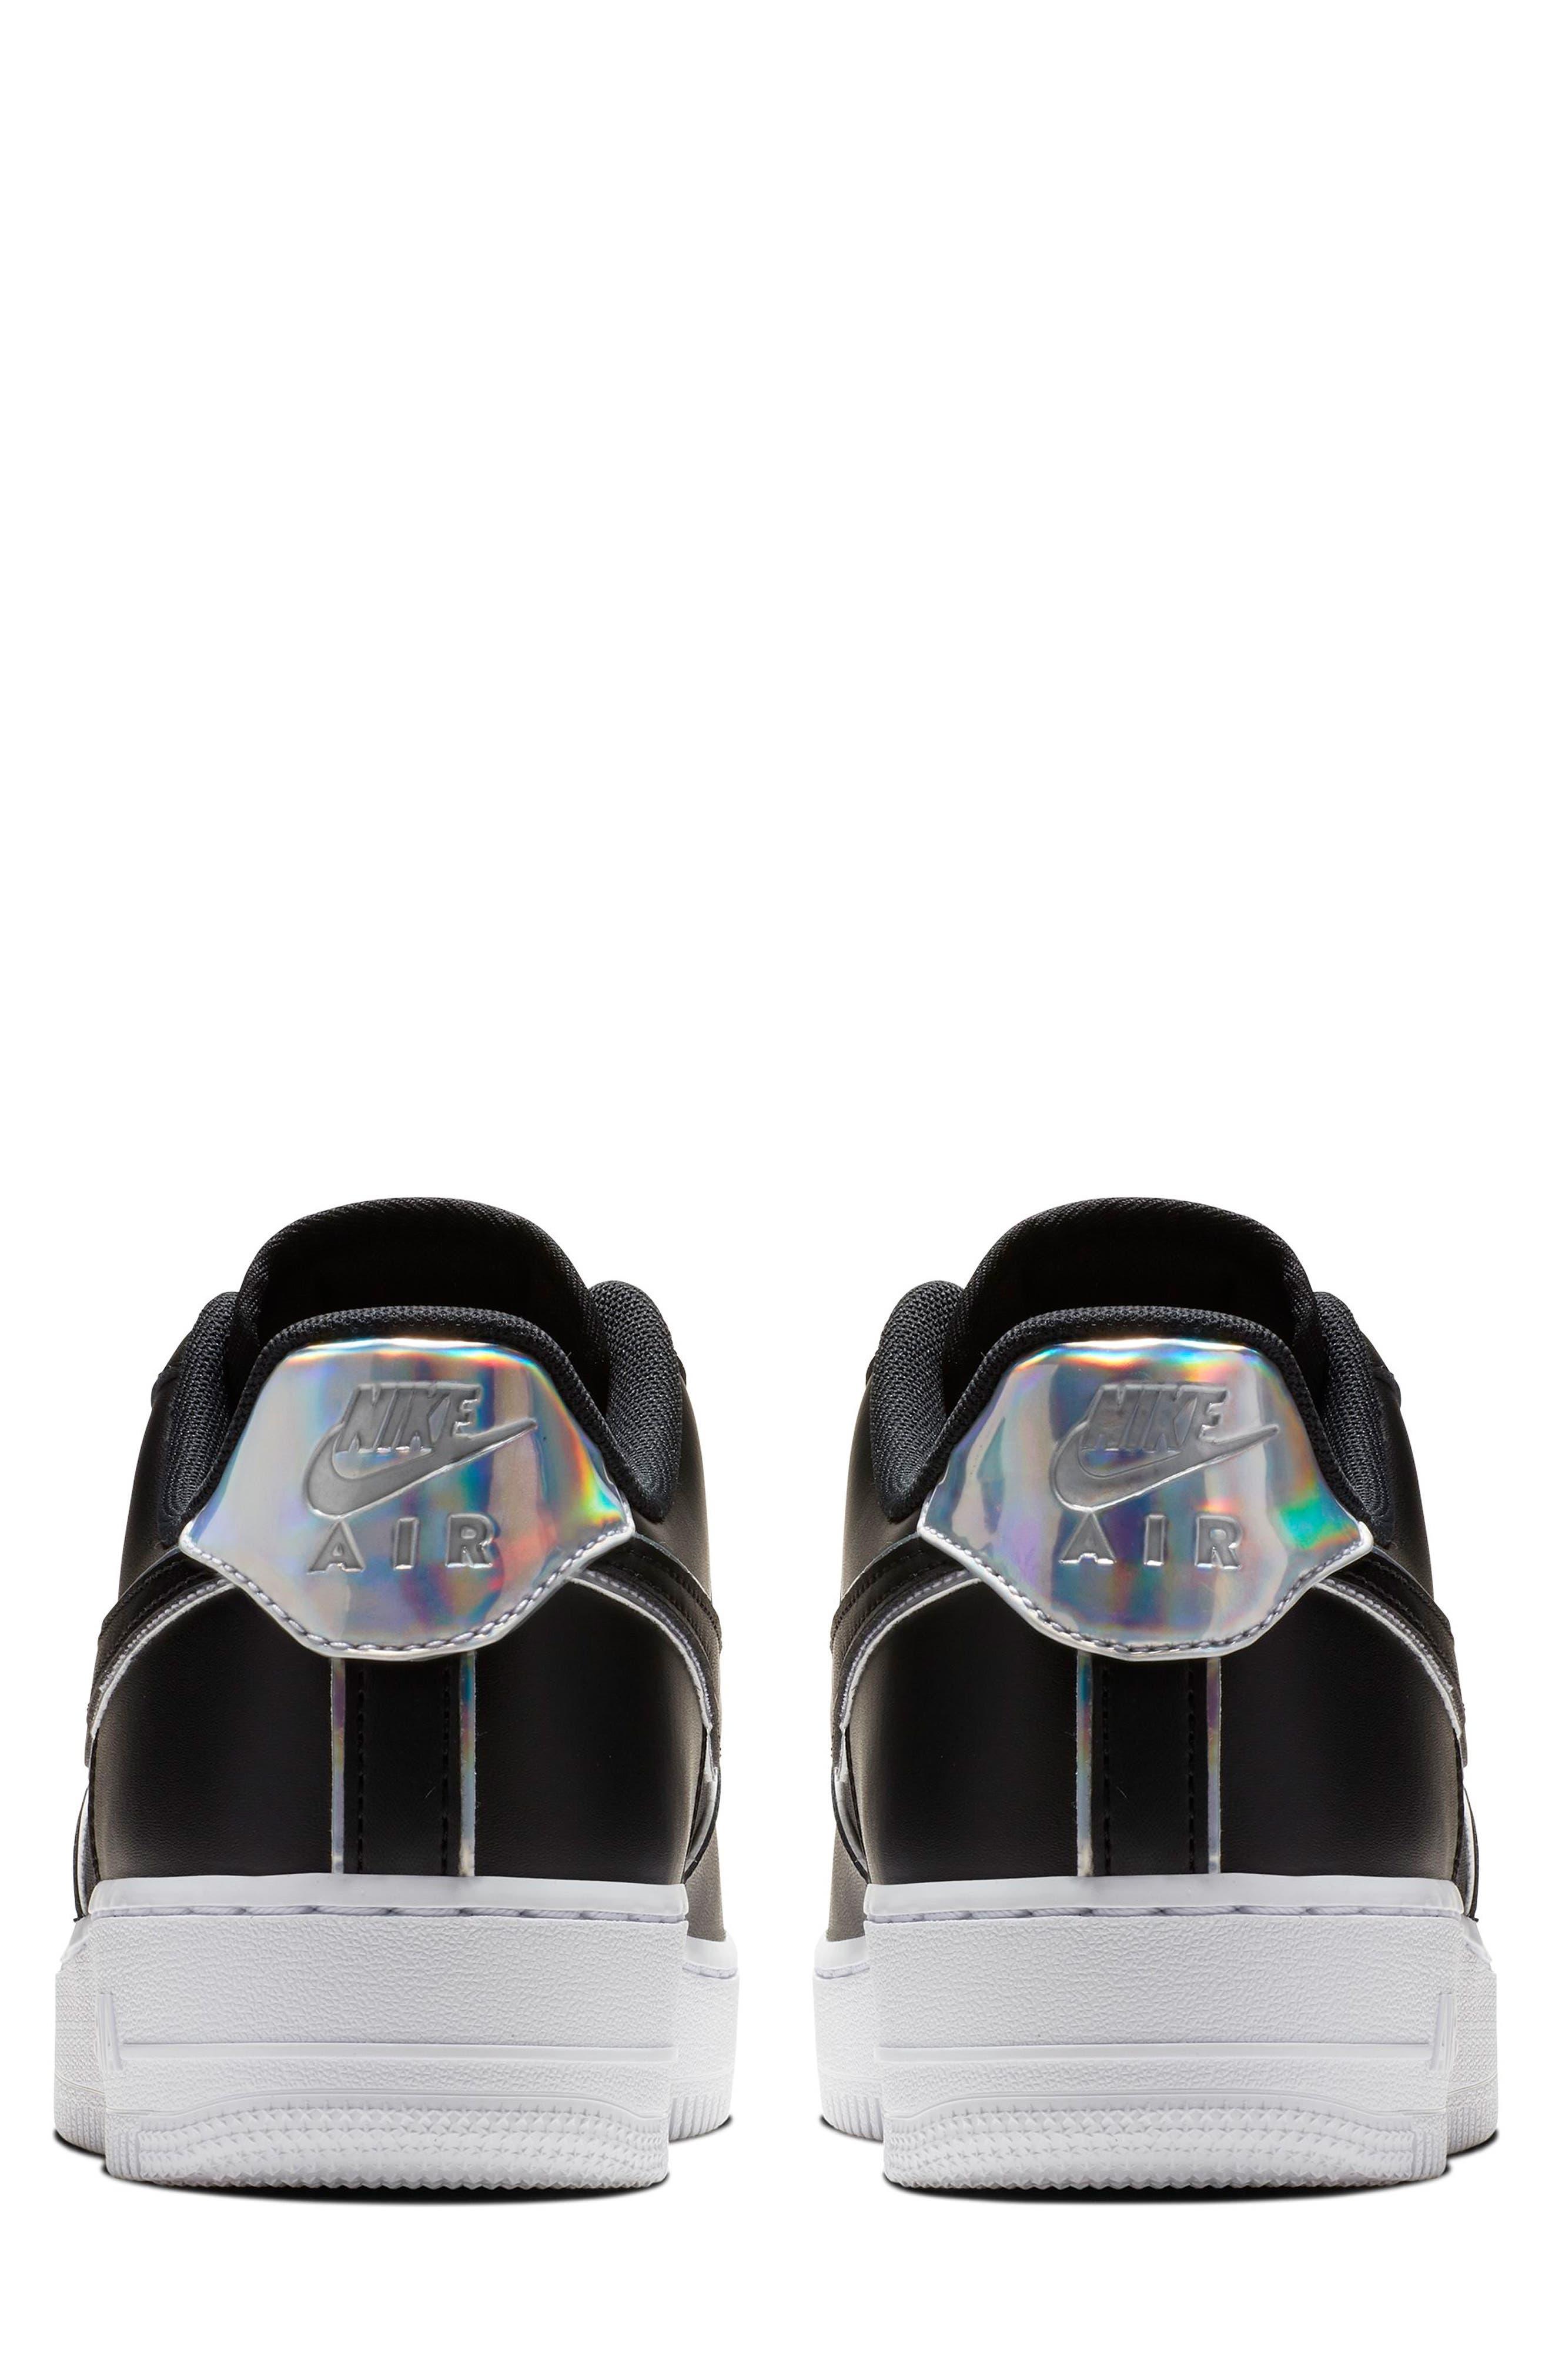 NIKE, Air Force 1 '07 LV8 4 Sneaker, Alternate thumbnail 2, color, 001